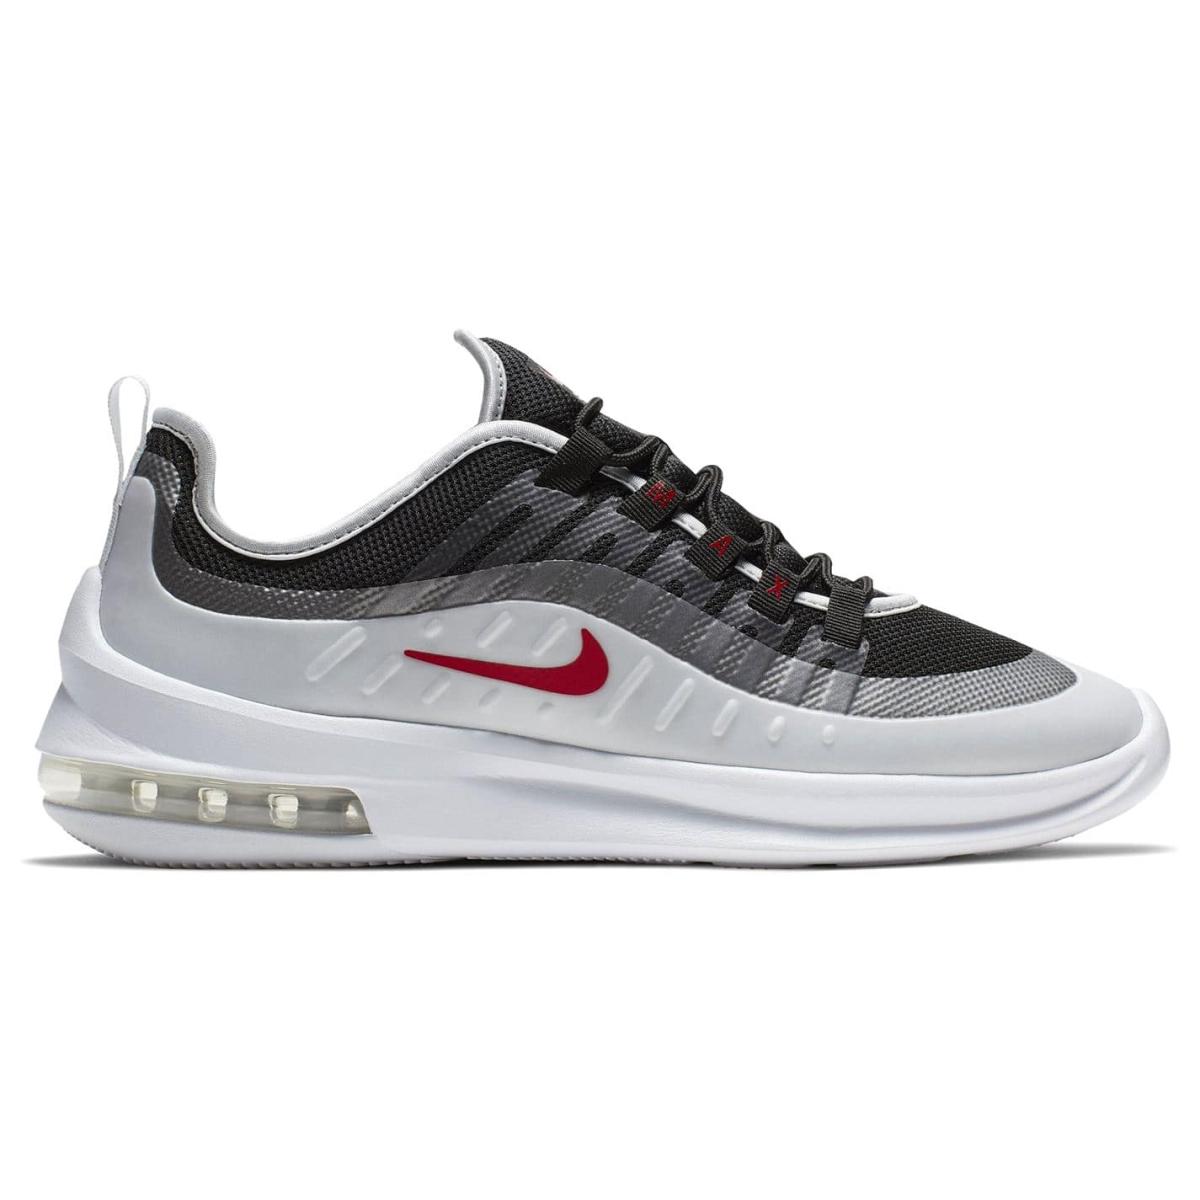 NIKE-Air-Max-Axis-Scarpe-da-ginnastica-Scarpe-da-Corsa-Uomo-Sneaker-Scarpe-Sportive-Fitness-1313 miniatura 19